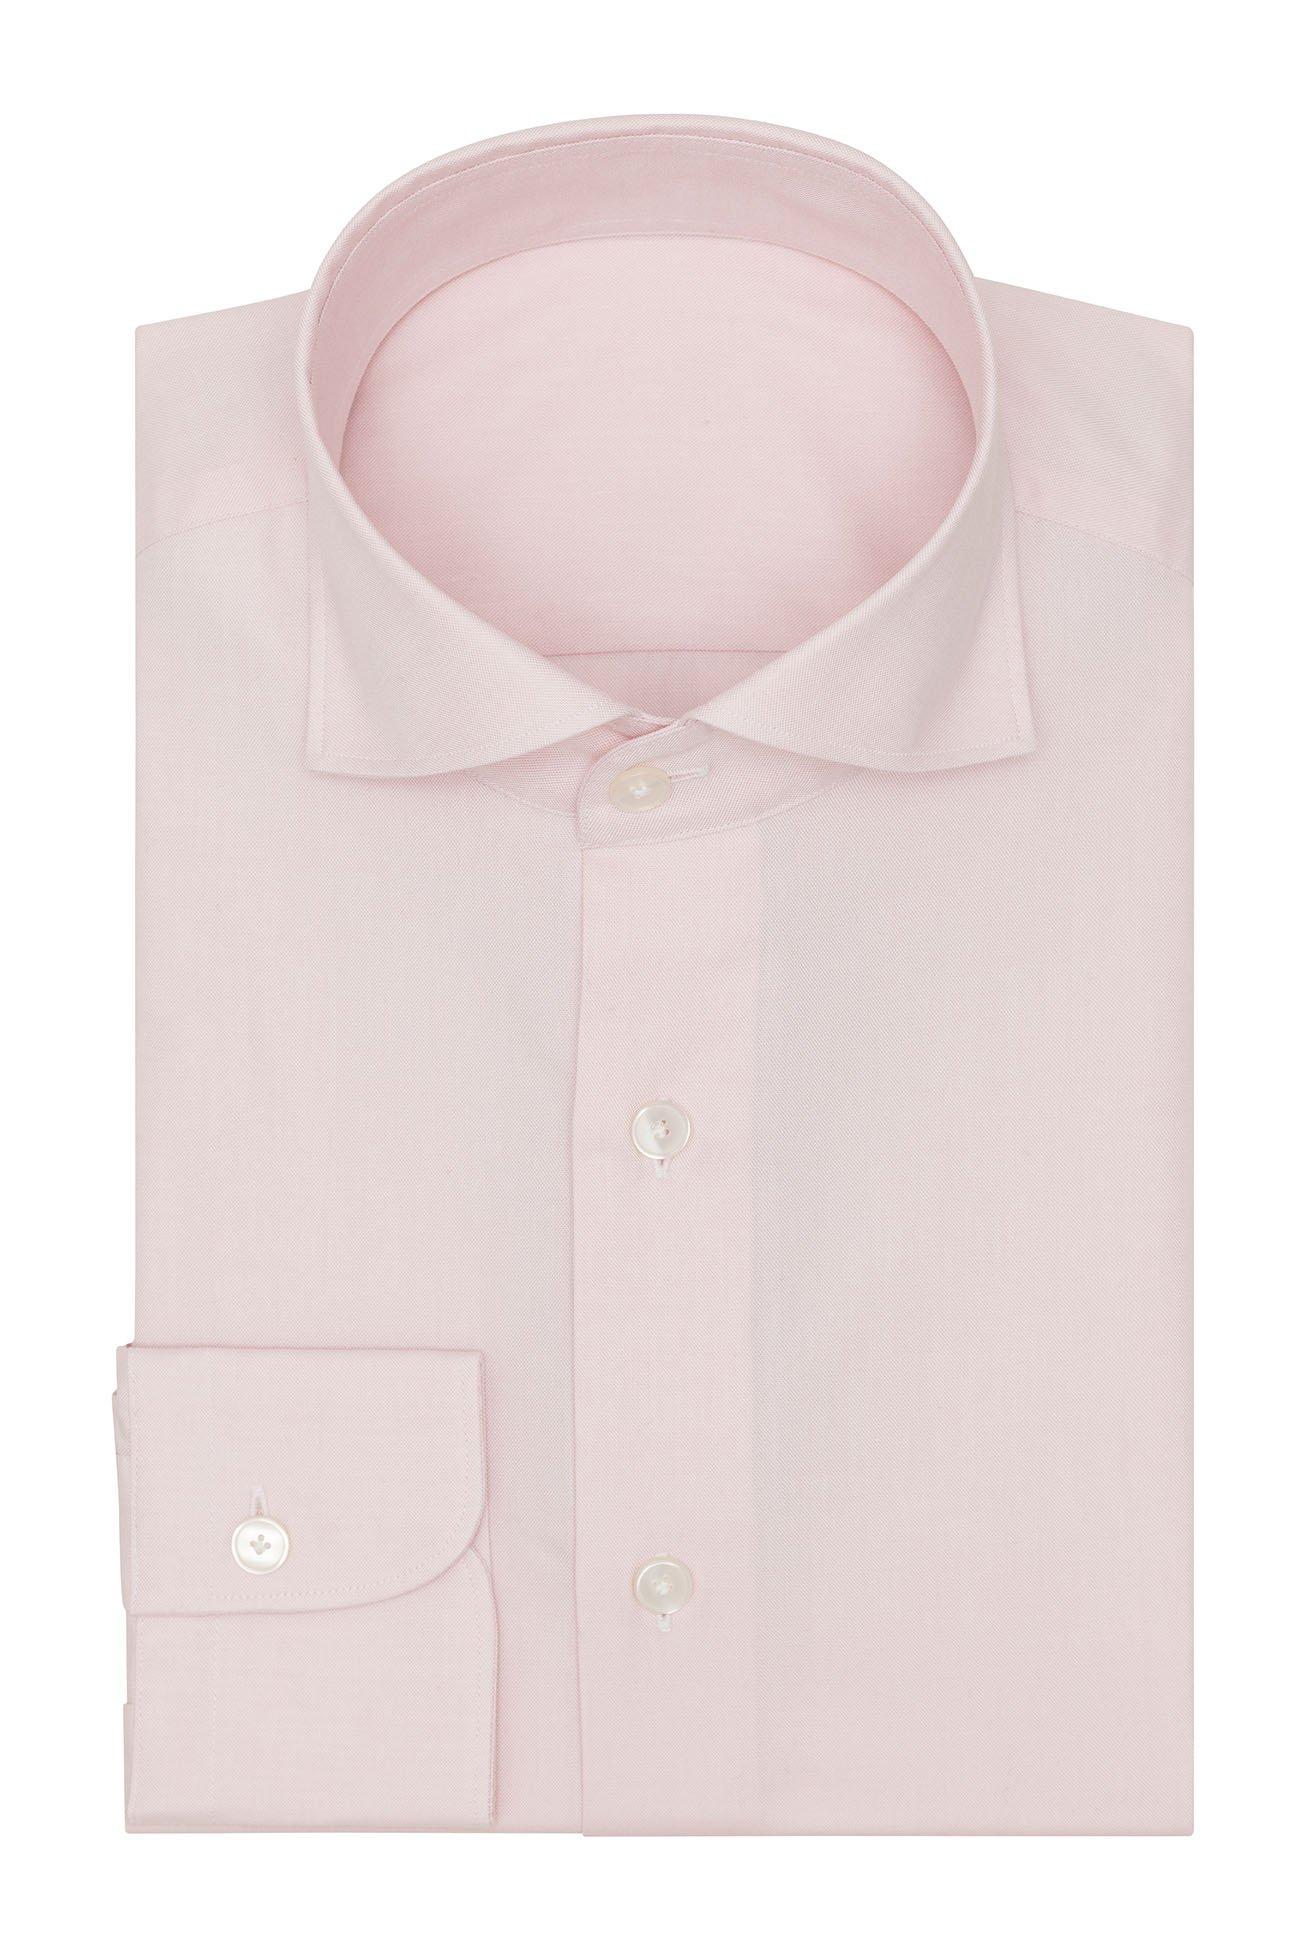 Oxford Pale Pink